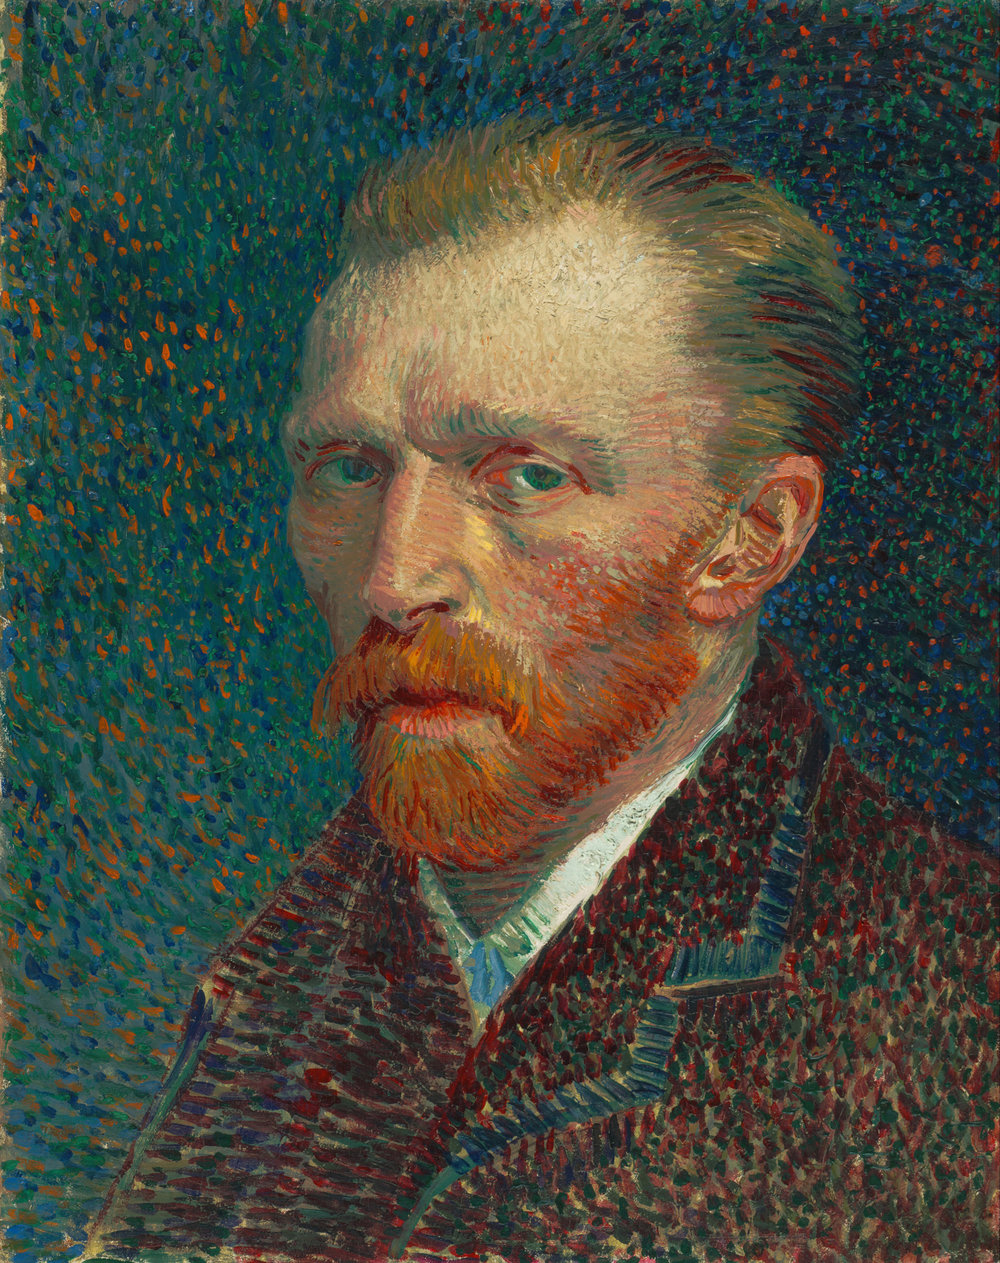 Vincent_van_Gogh_-_Self-Portrait_-_Google_Art_Project_(454045).jpg